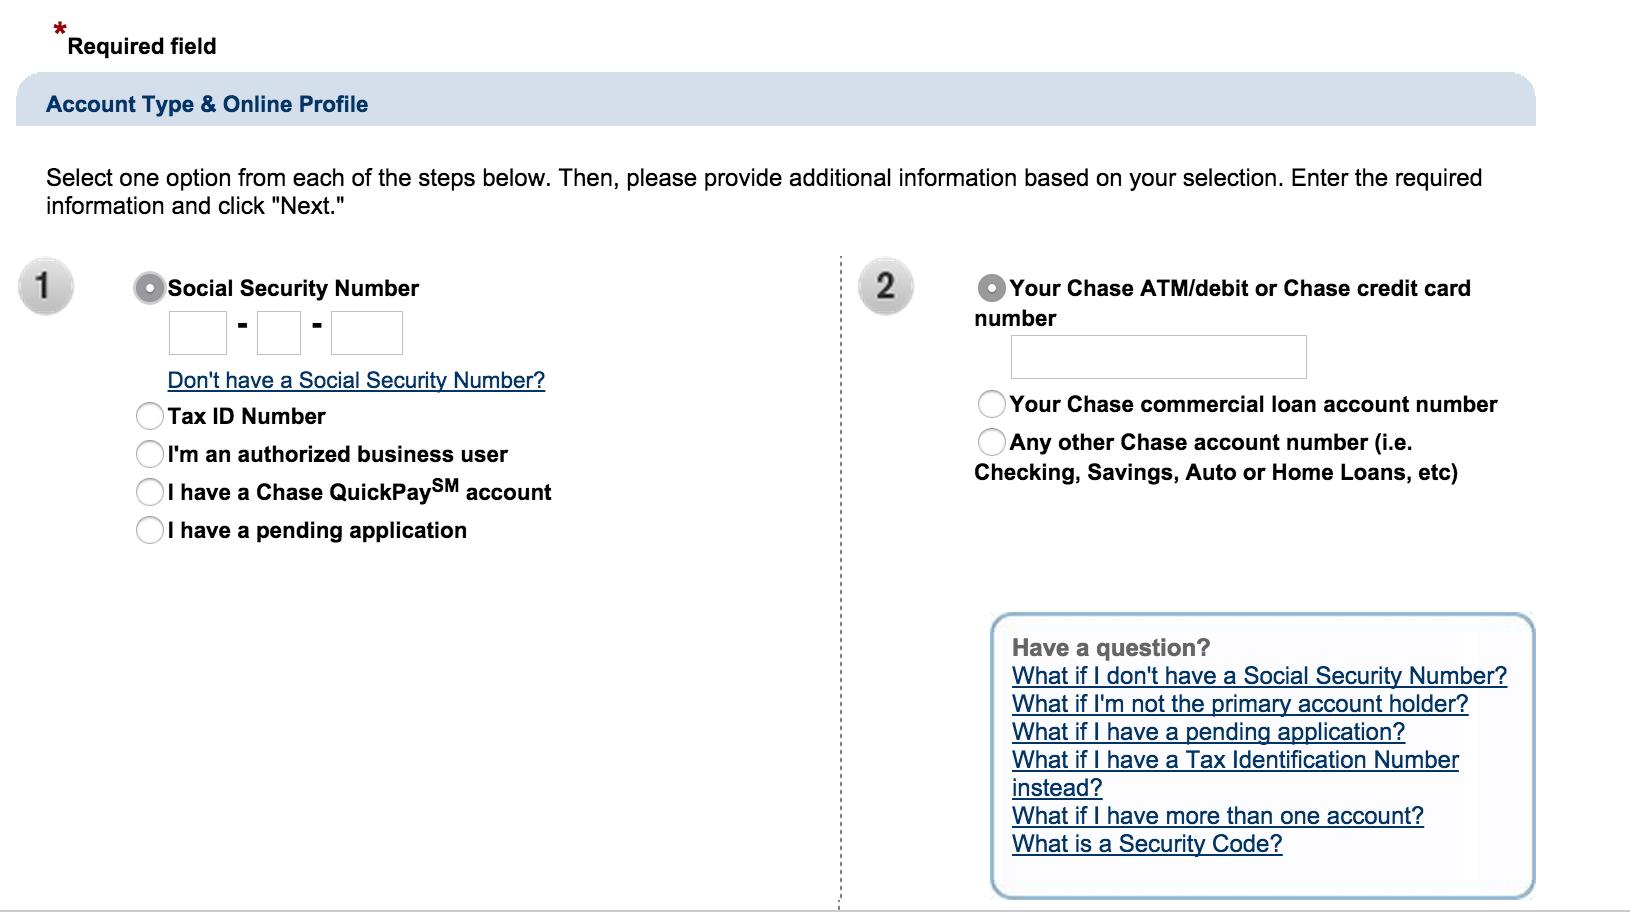 southwest cred card forgot userid password - Southwest Visa Credit Card